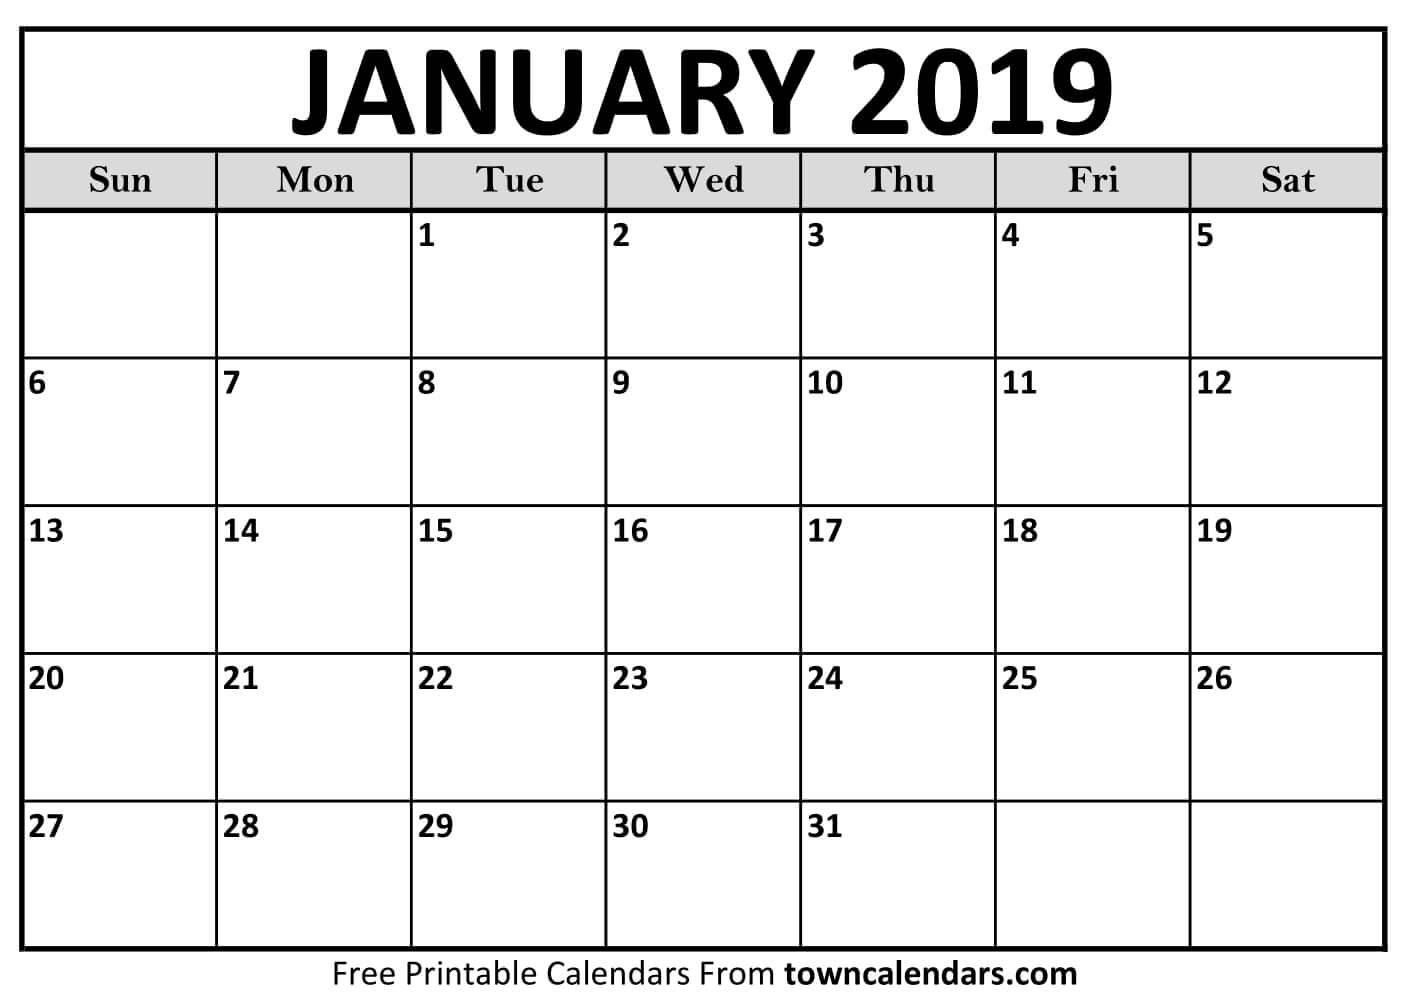 Printable January 2019 Calendar - Towncalendars Jan 4 2019 Calendar